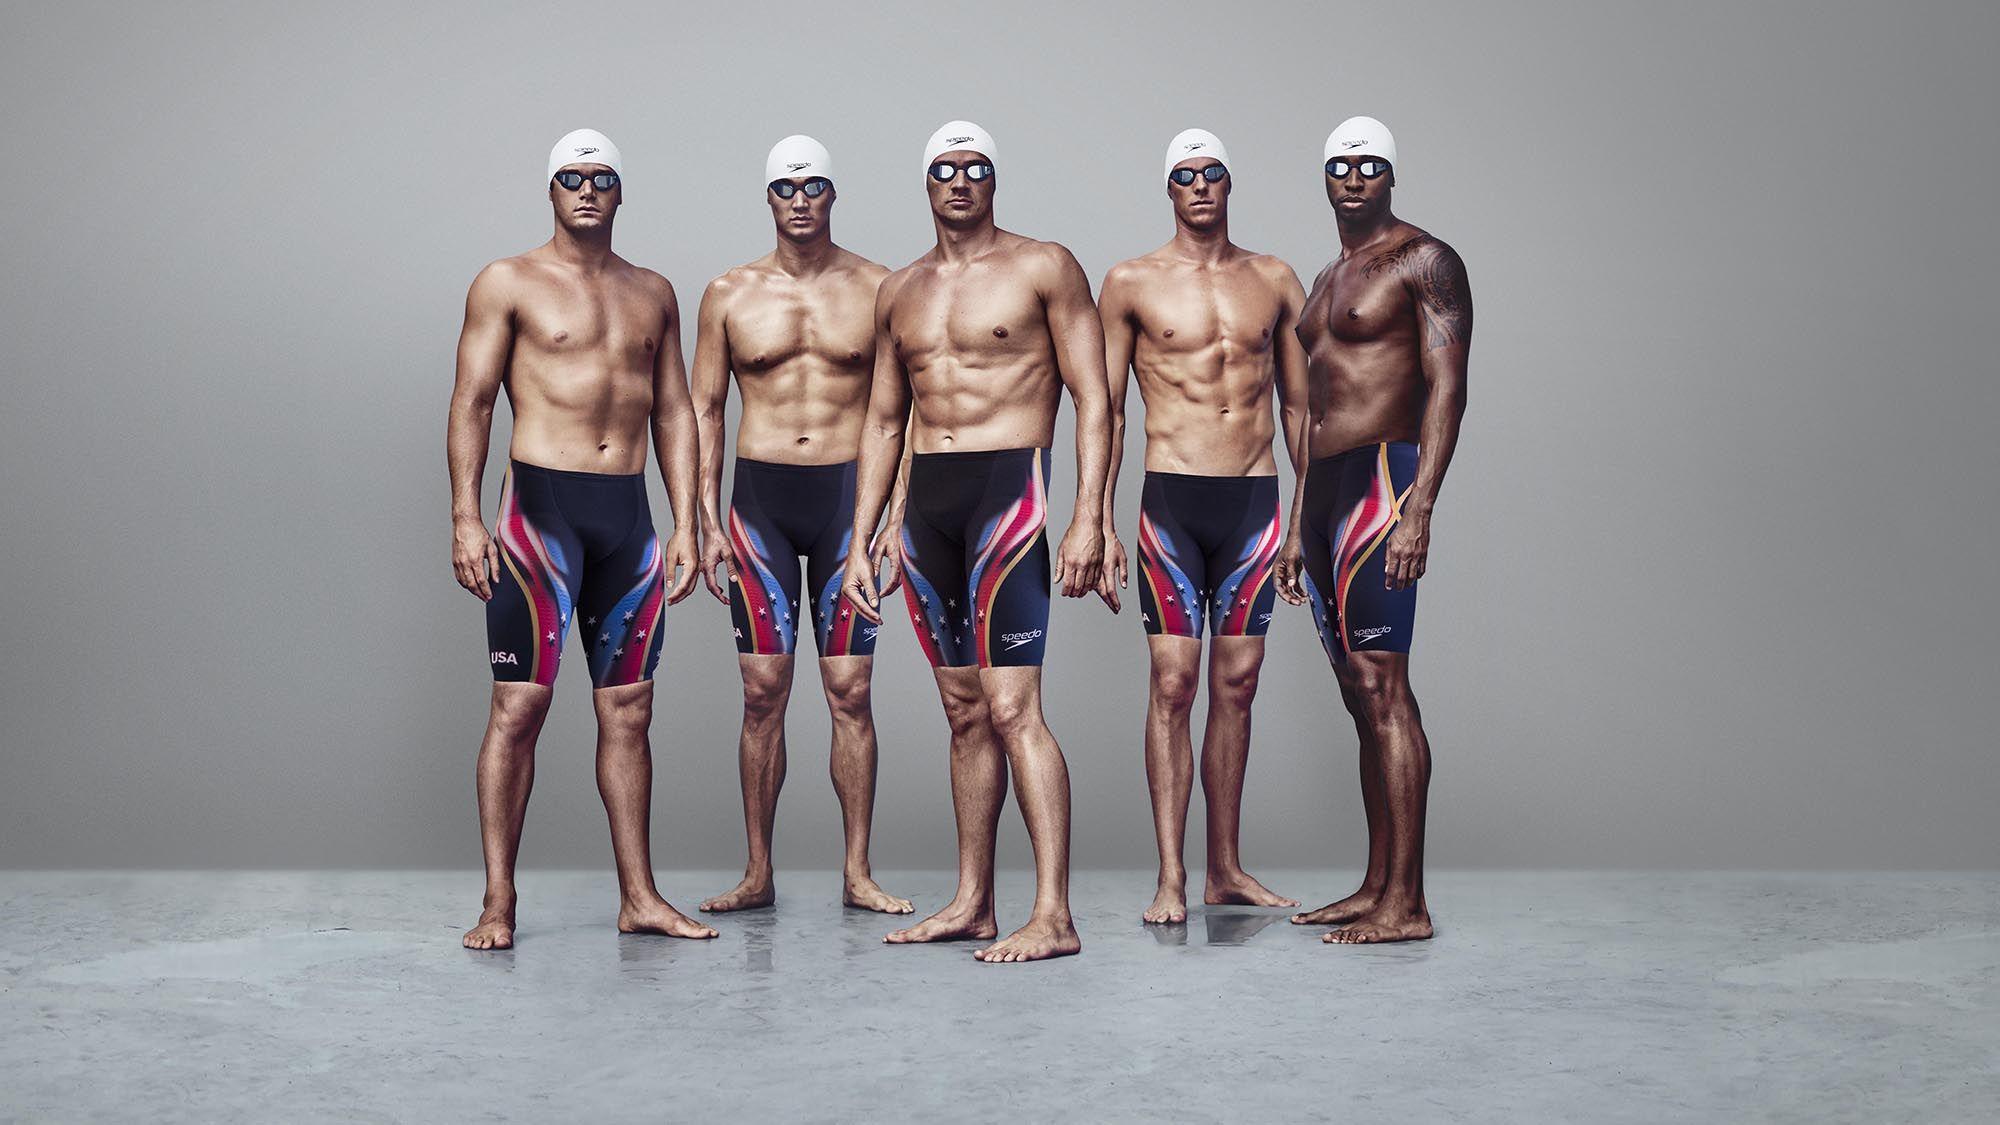 Nike Roshe Courir Hommes 2016 Équipe De Natation Olympique